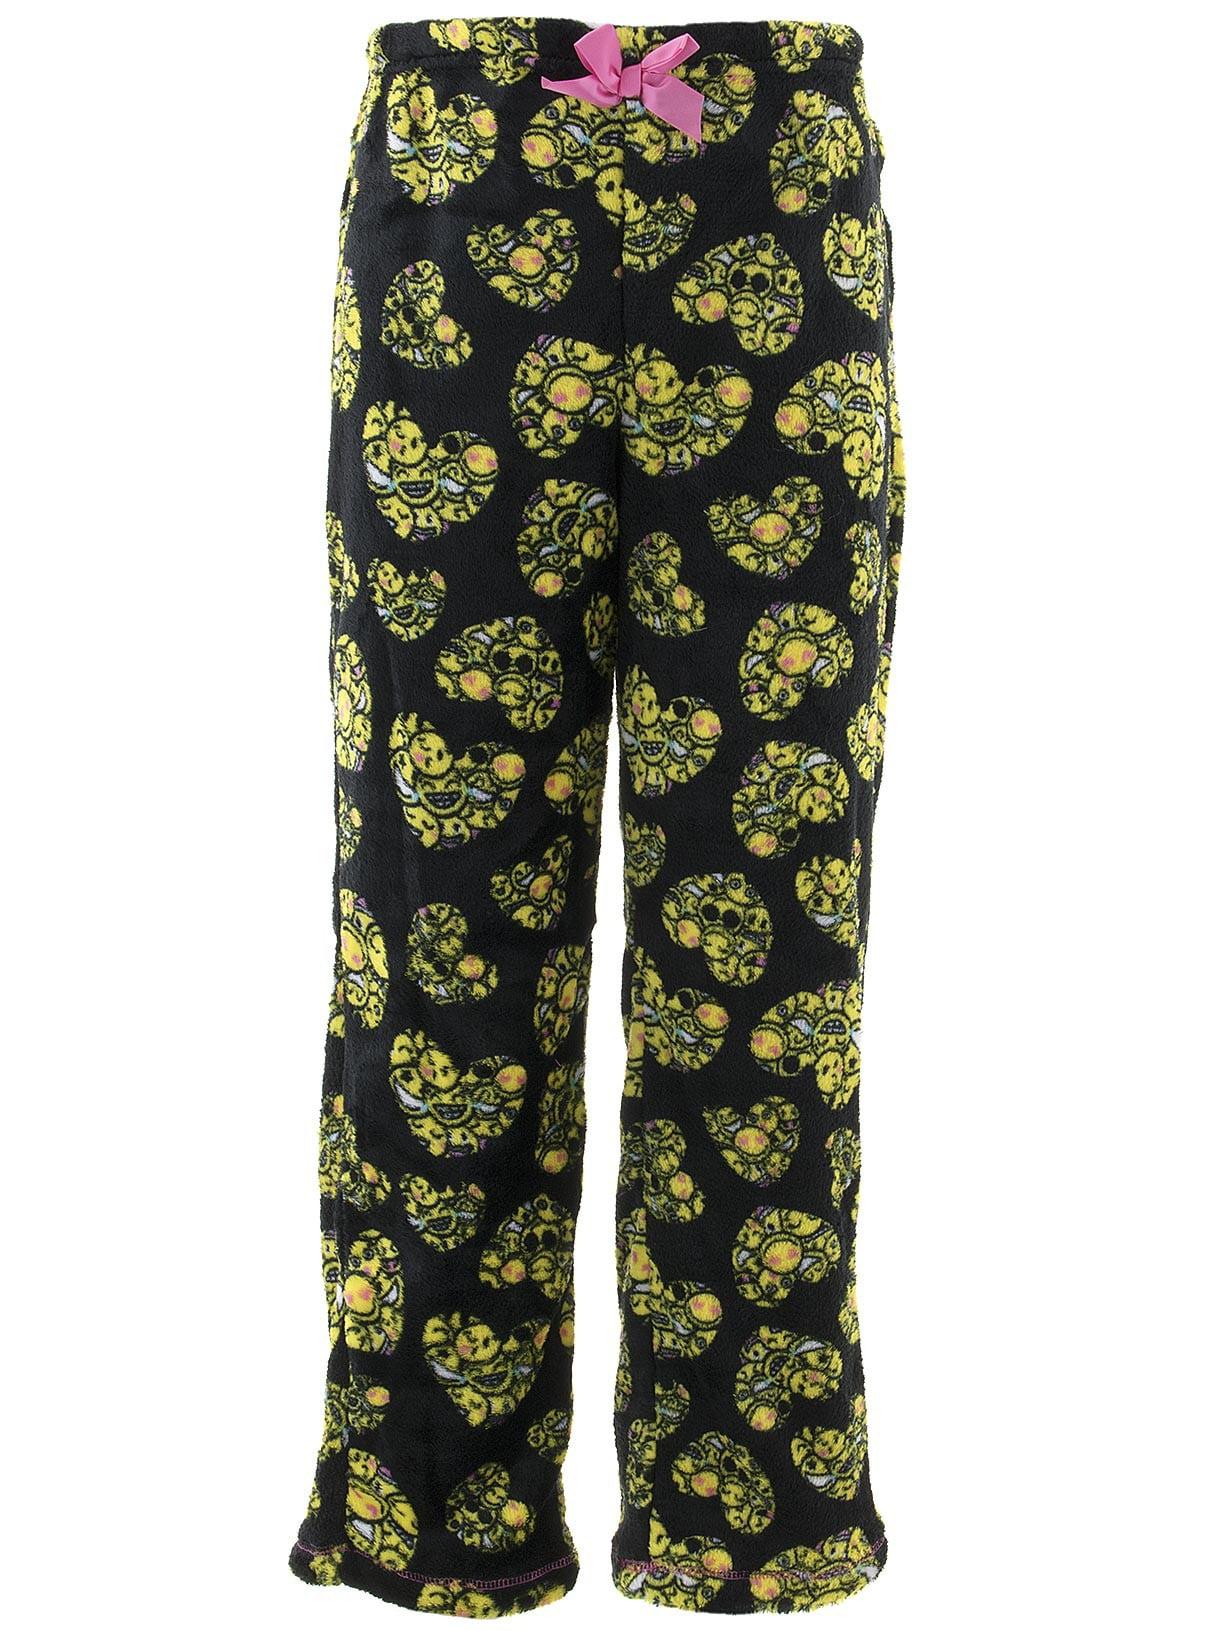 Rene Rofe Girls Emoji Hearts Black Fleece Pajama Pants